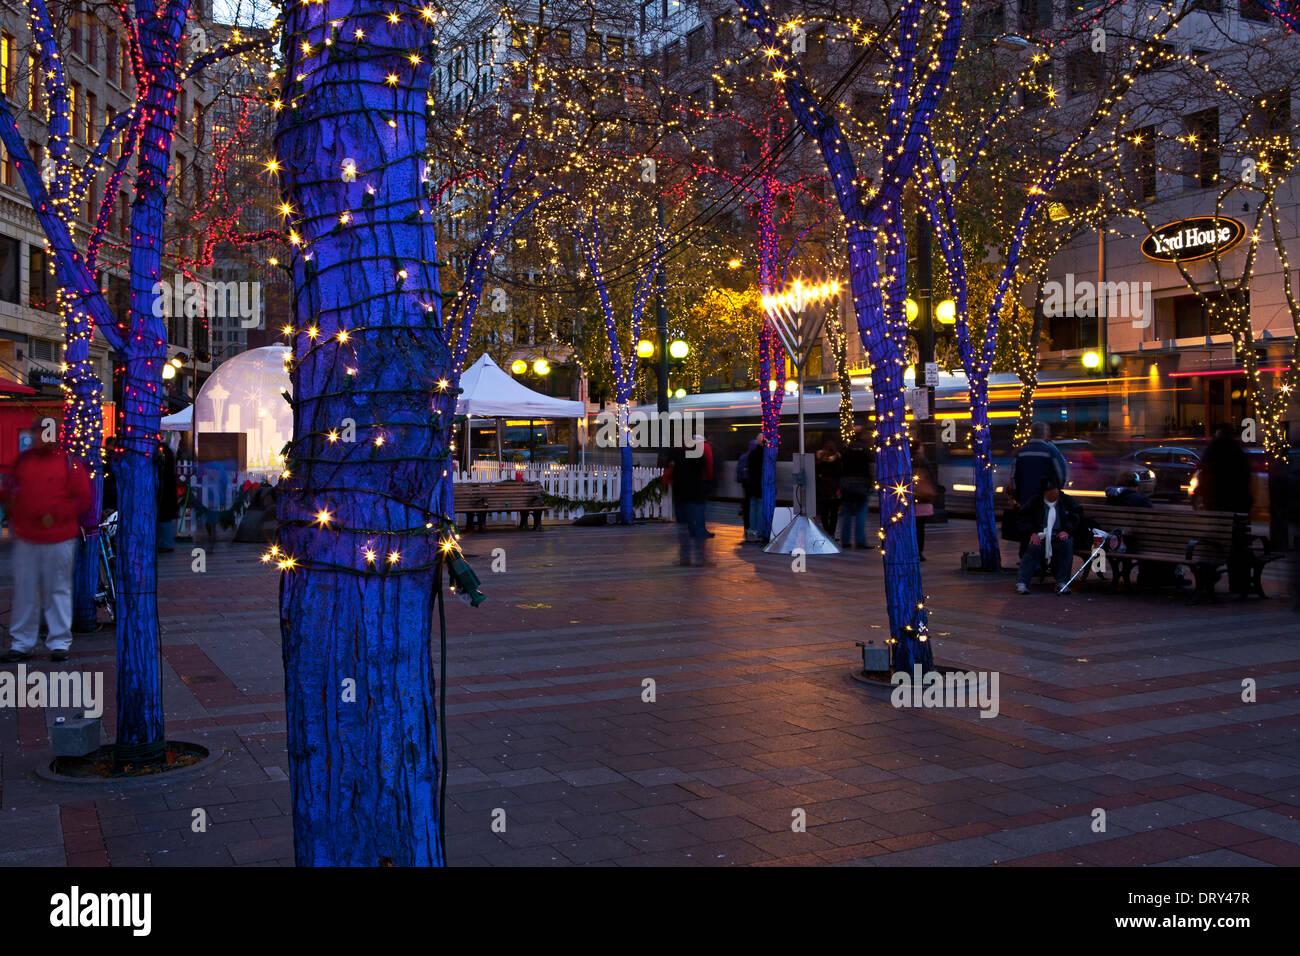 Seattle Christmas.Washington Westlake Park In Downtown Seattle With